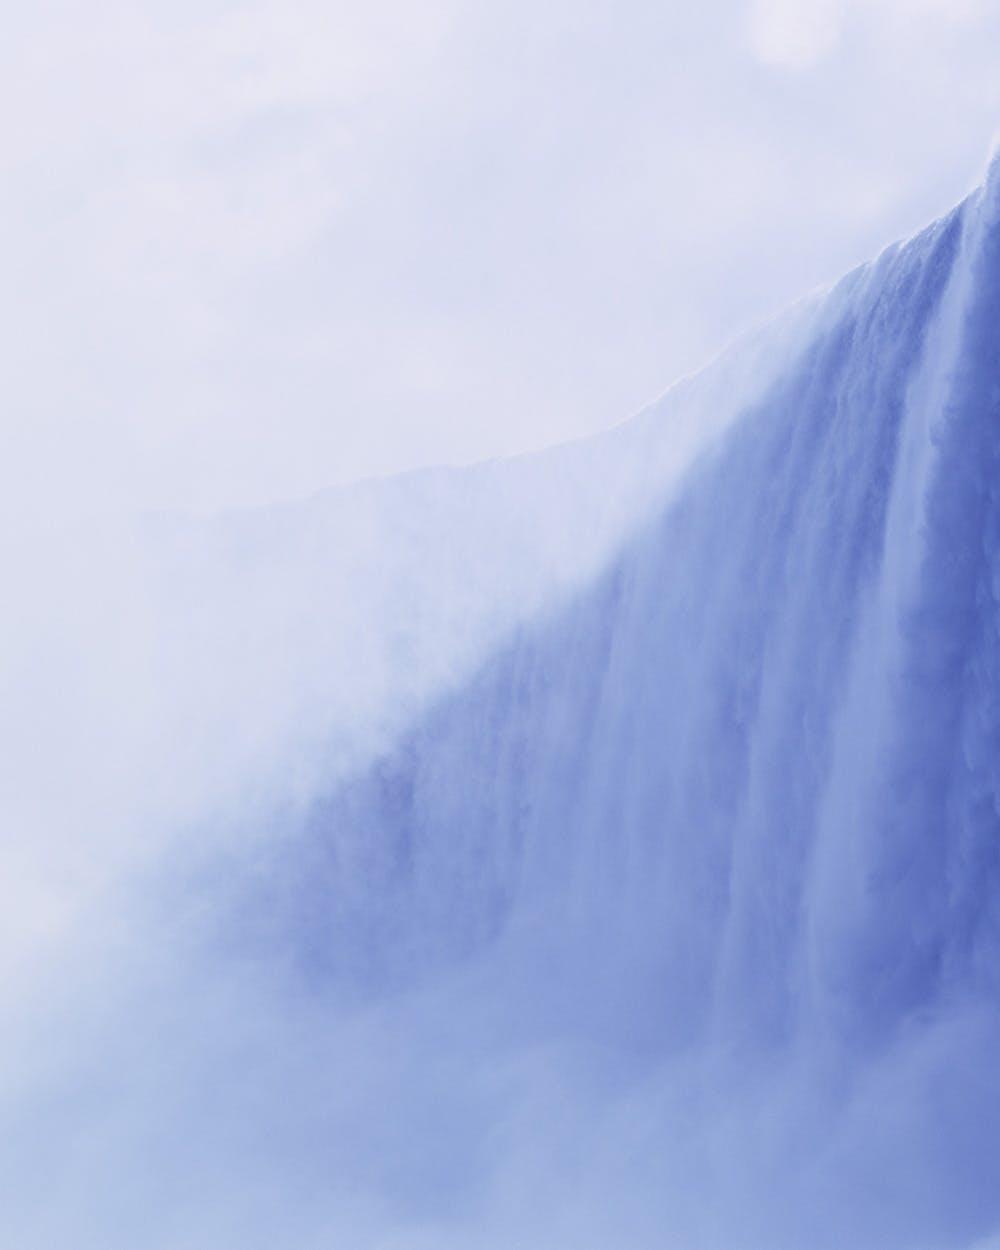 LAND Niagara falls #01